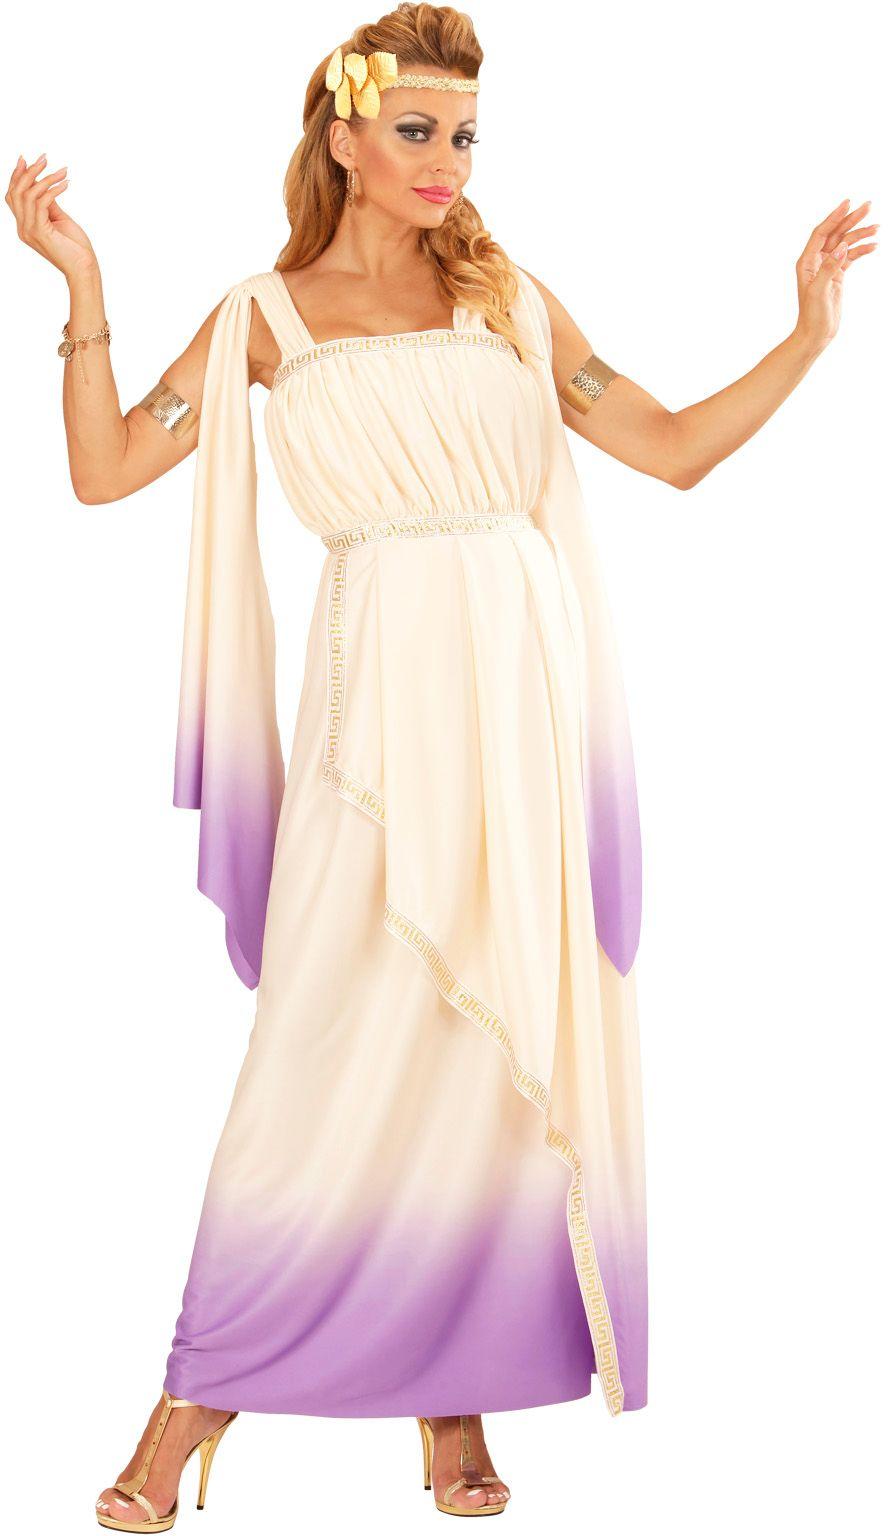 Wit lavendel kleurige jurk